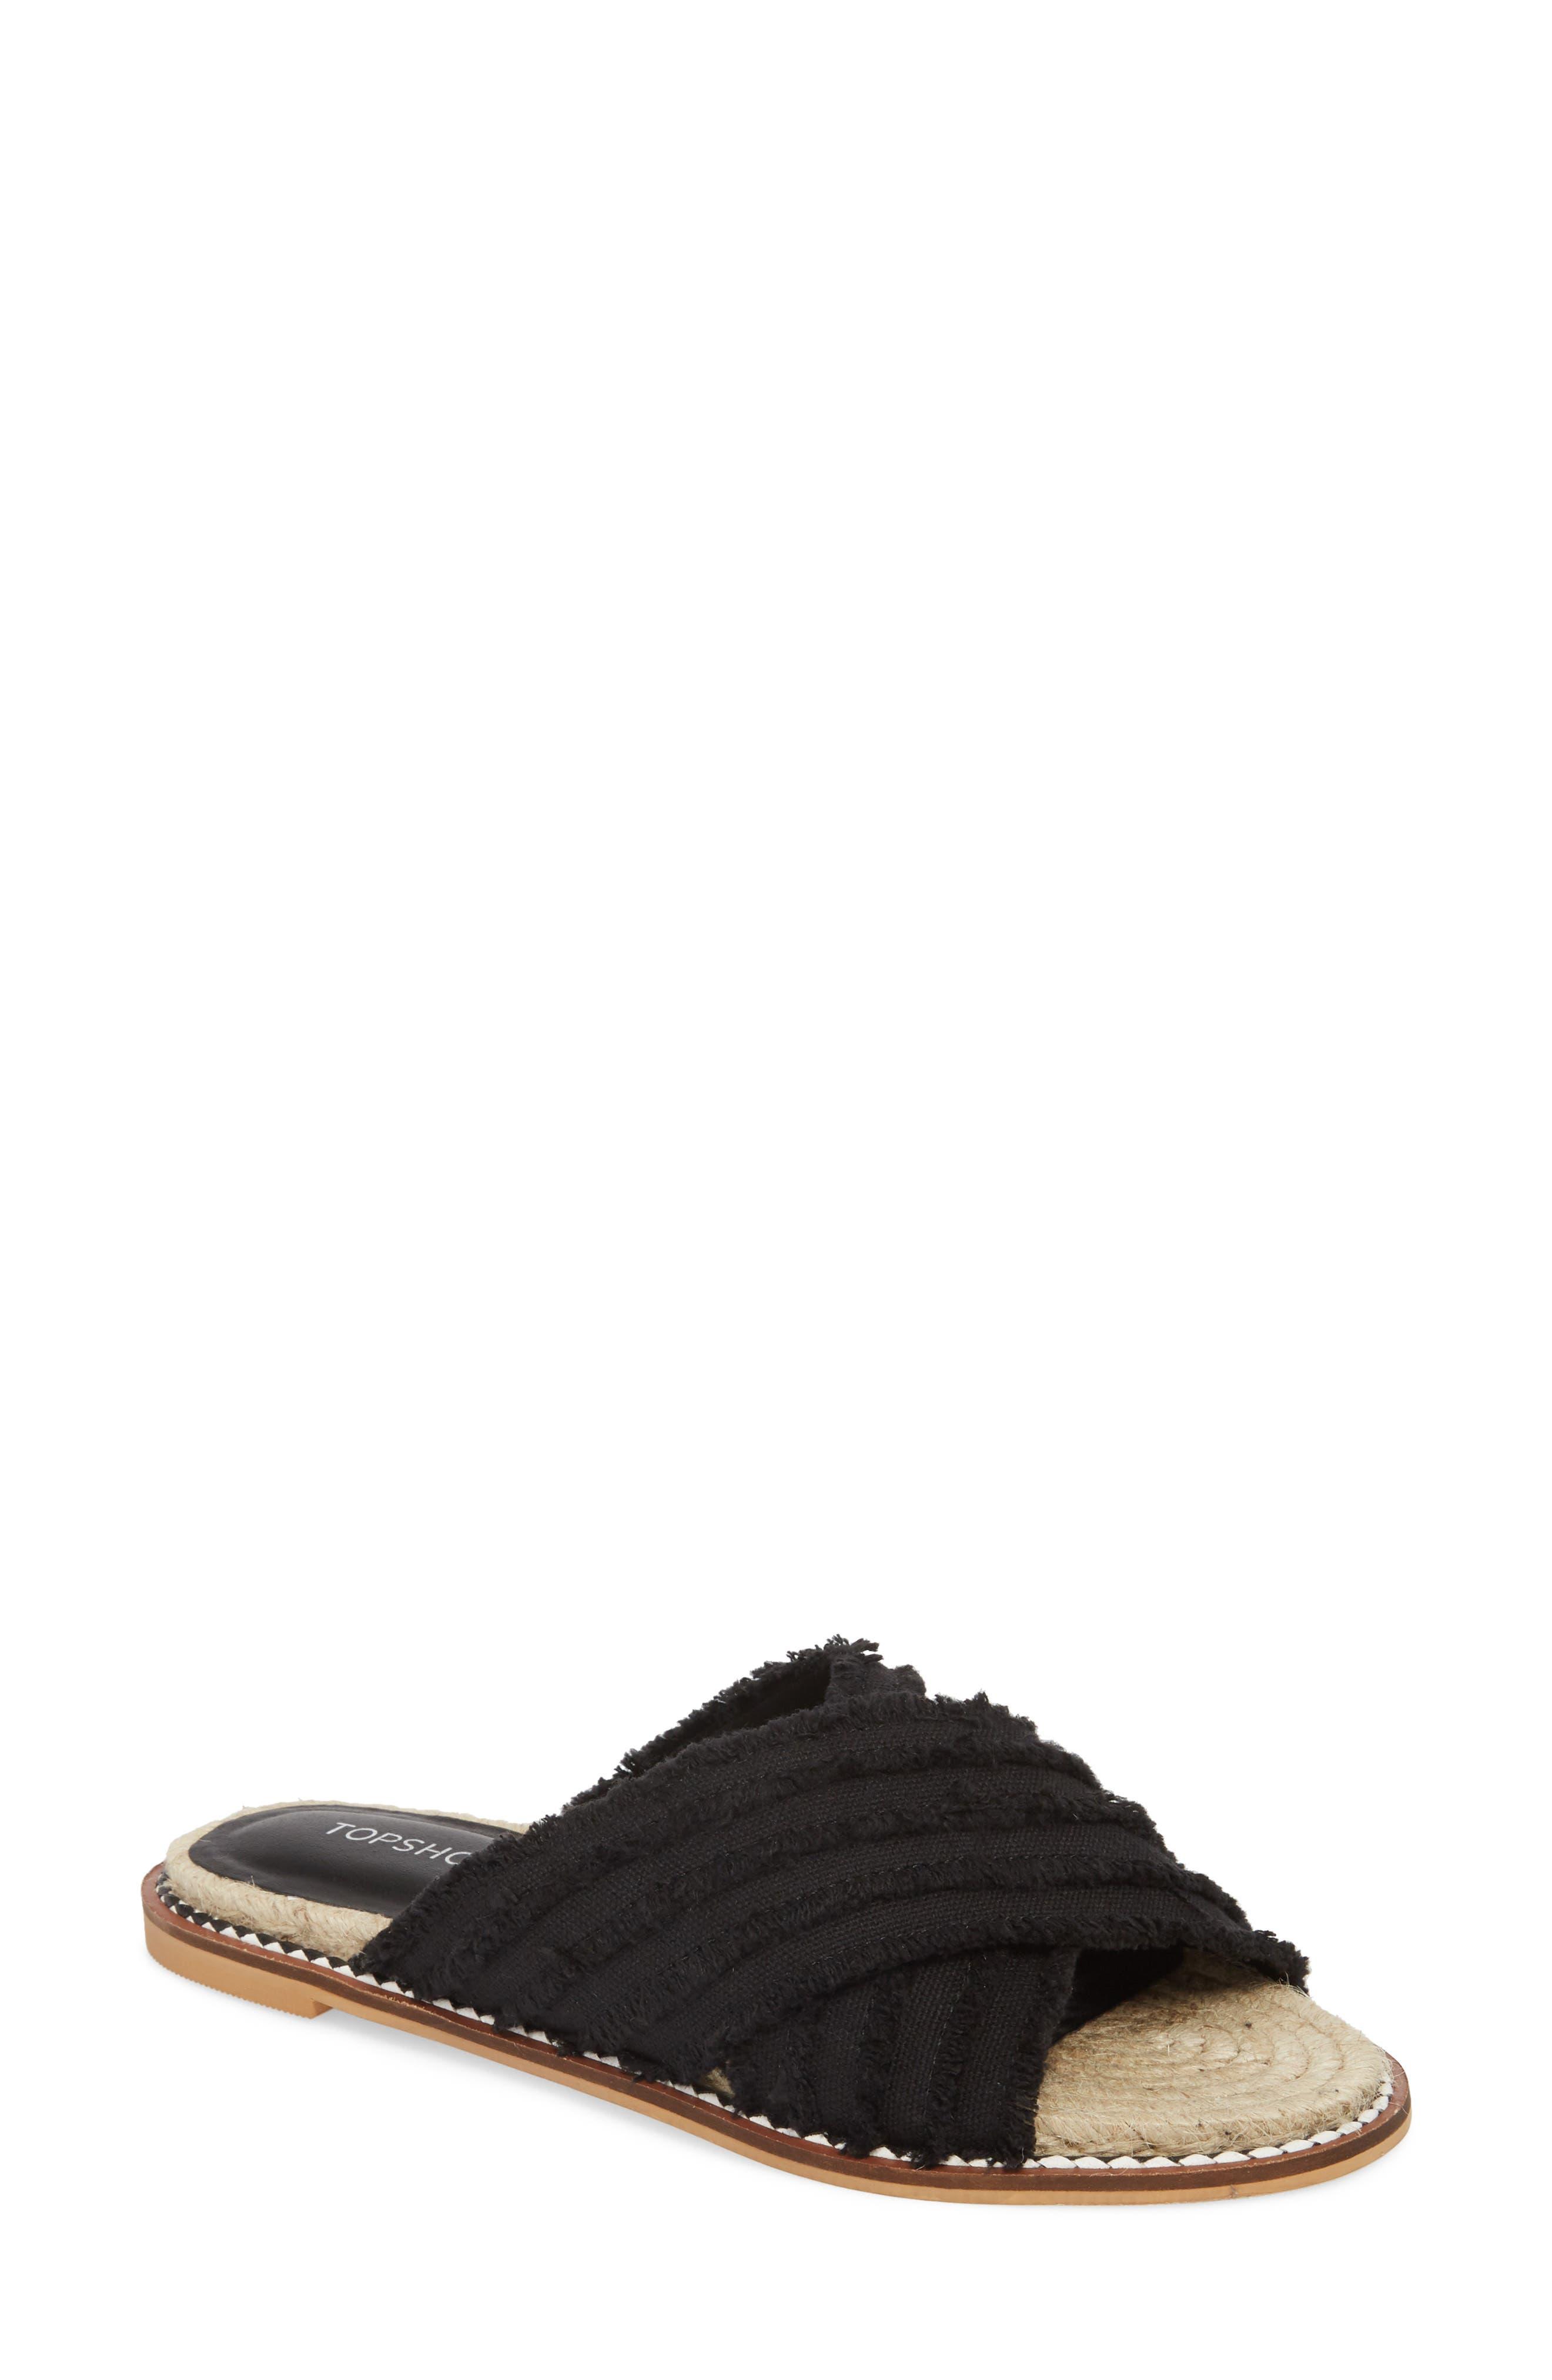 Hibiscus Slide Sandal,                         Main,                         color, 001